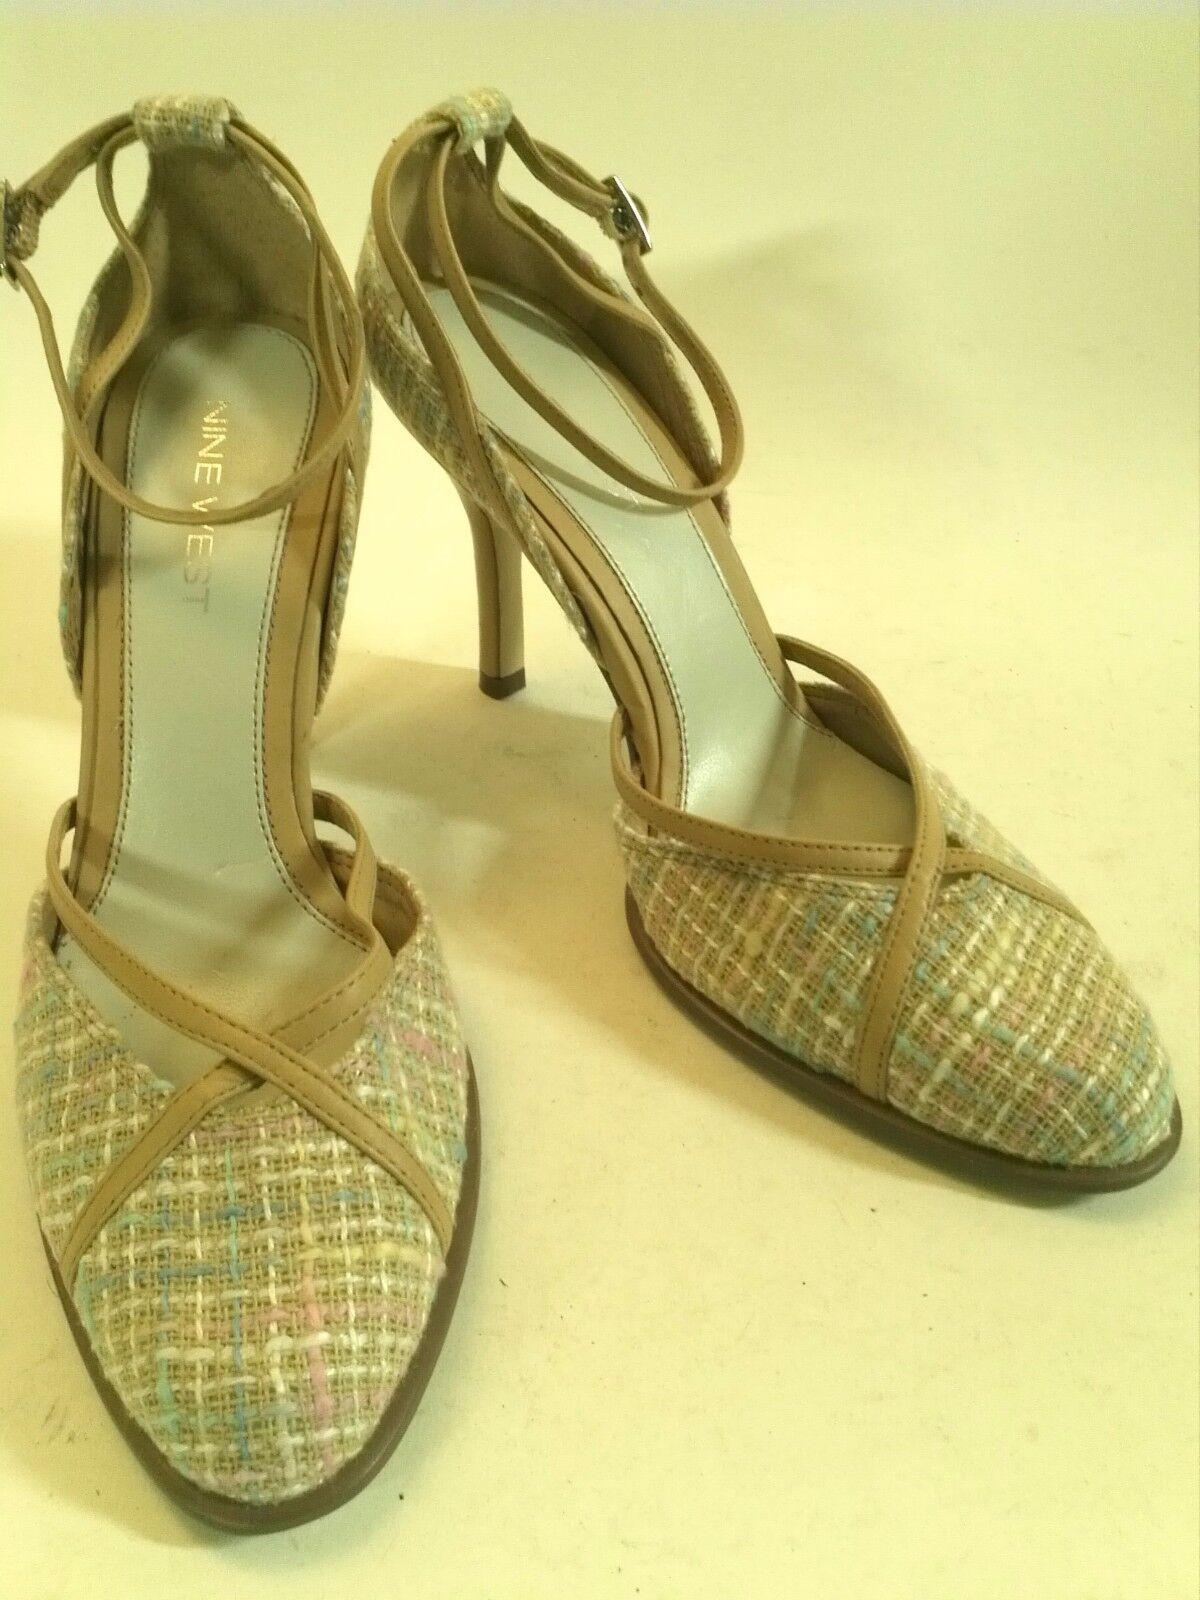 NINE WEST Nuruo Textile Beige Leather and Multi Textile Nuruo Weave HEELS 3